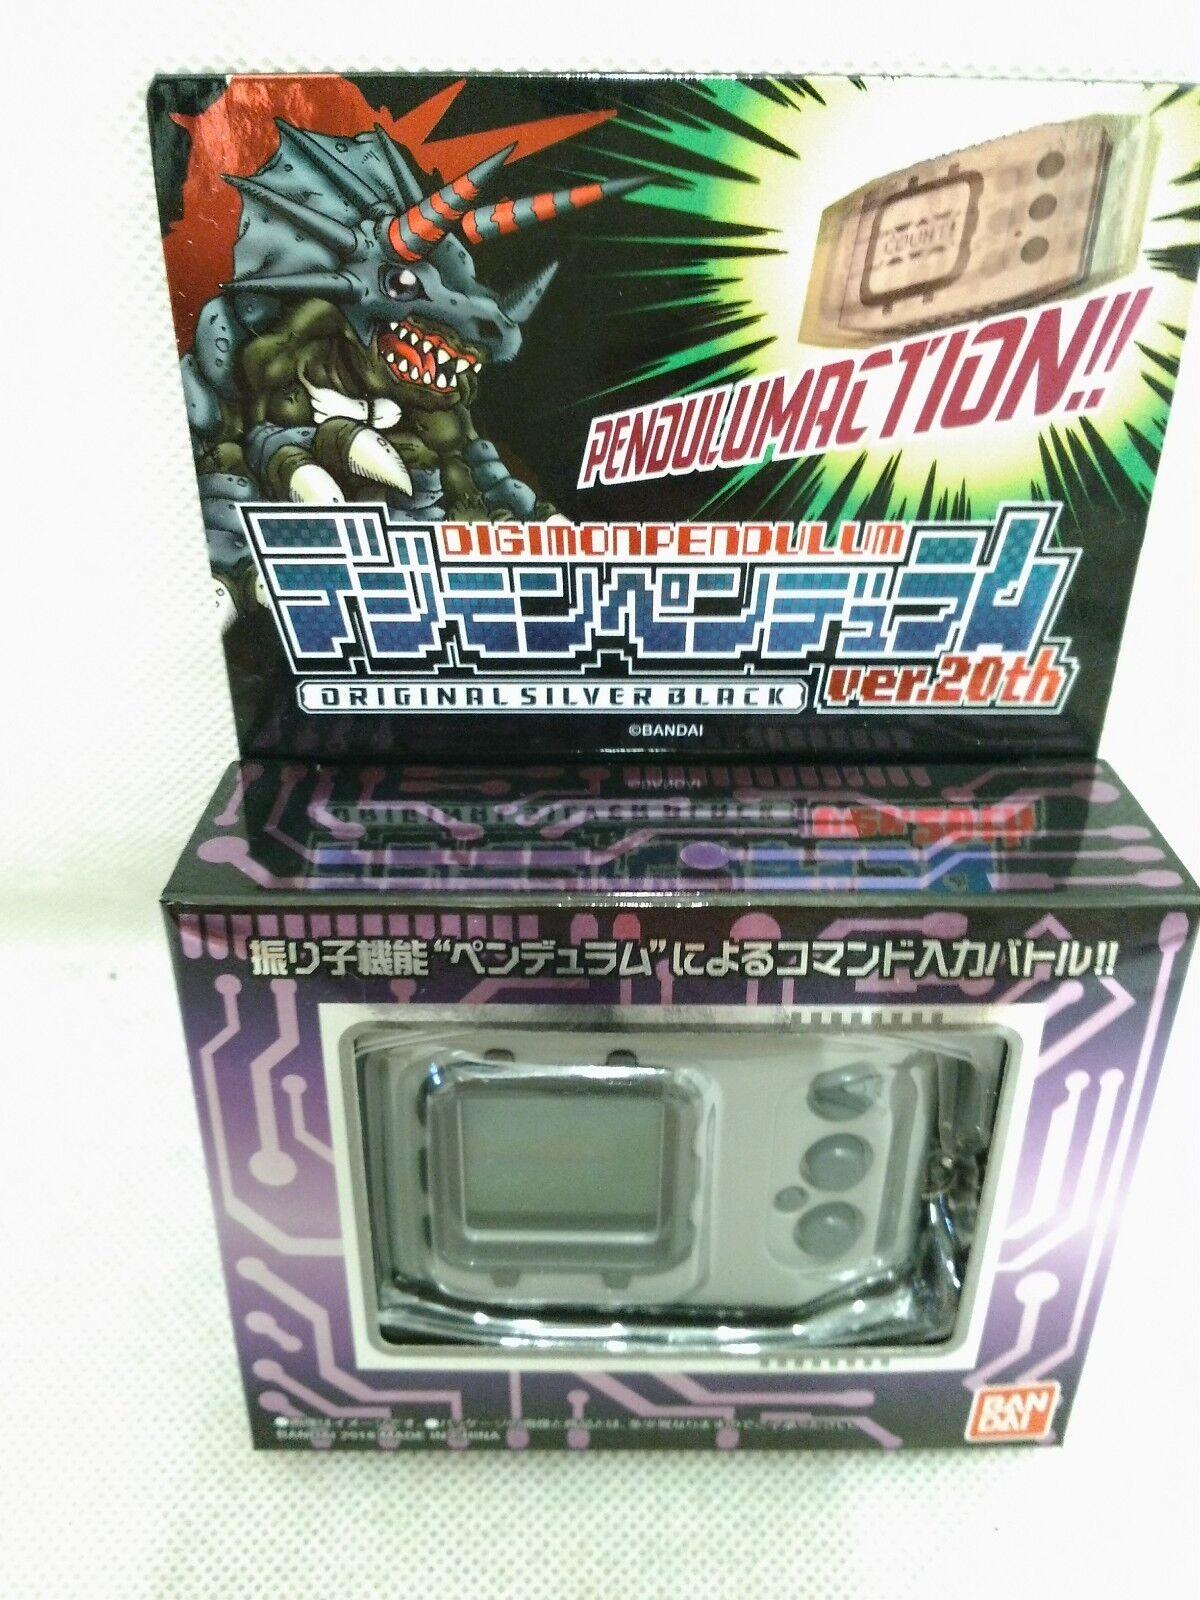 Bandai Digital Montruo Digimon Péndulo Ver.20th Original Negro Plata Reeditado